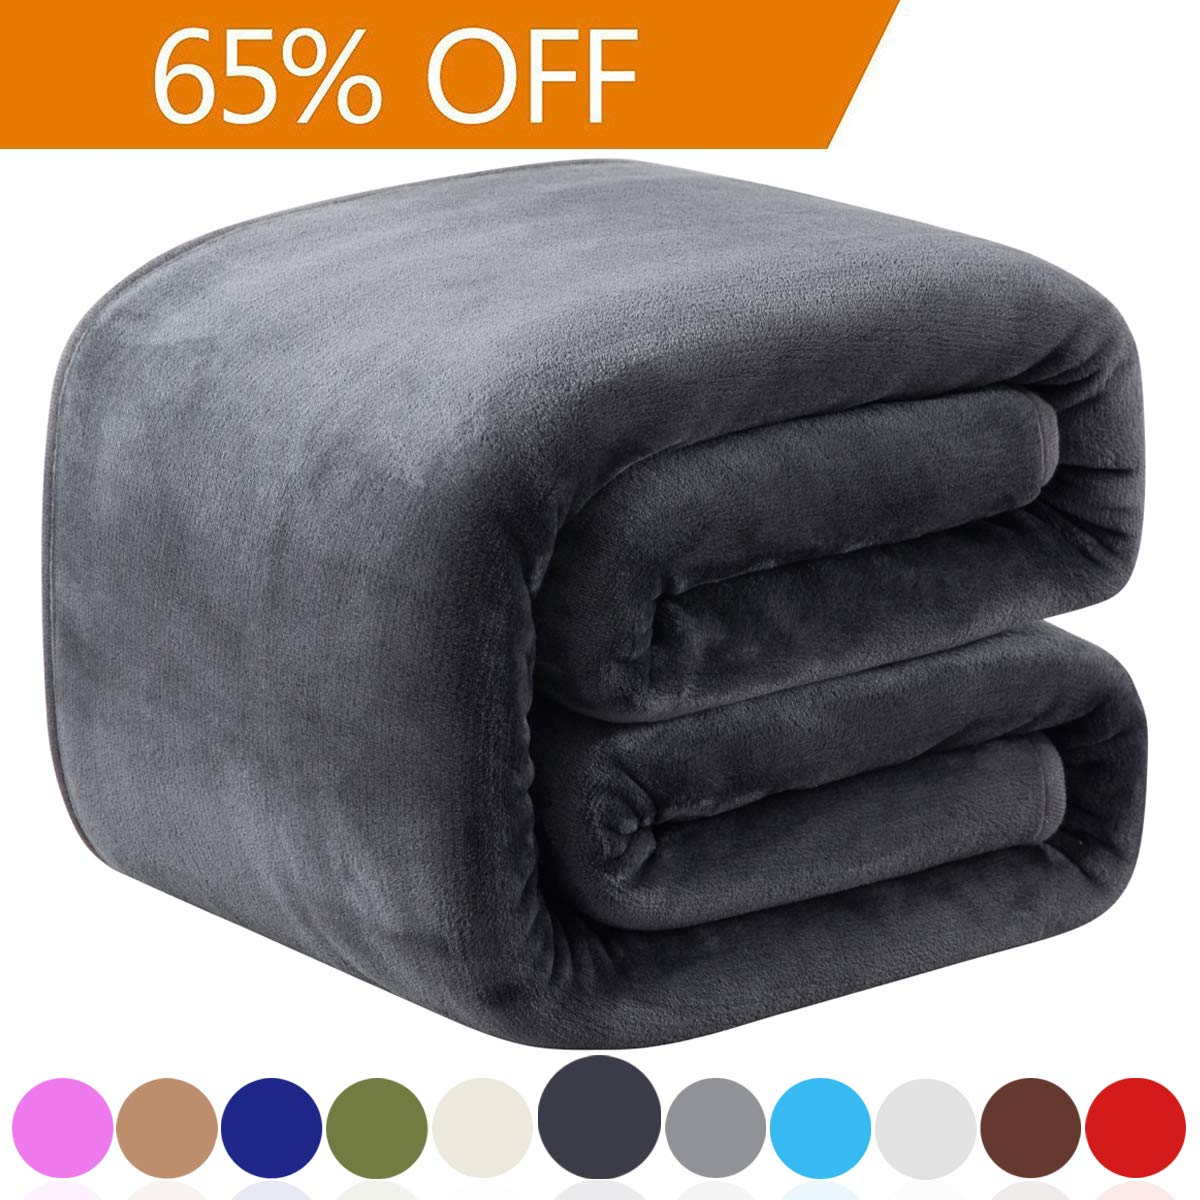 Richave Fleece Queen Size Summer Blanket All Season 350GSM Lightweight Throw for The Bed Extra Soft Brush Fabric Winter Warm Sofa Blanket 90'' x 90''(Dark Gray Queen)